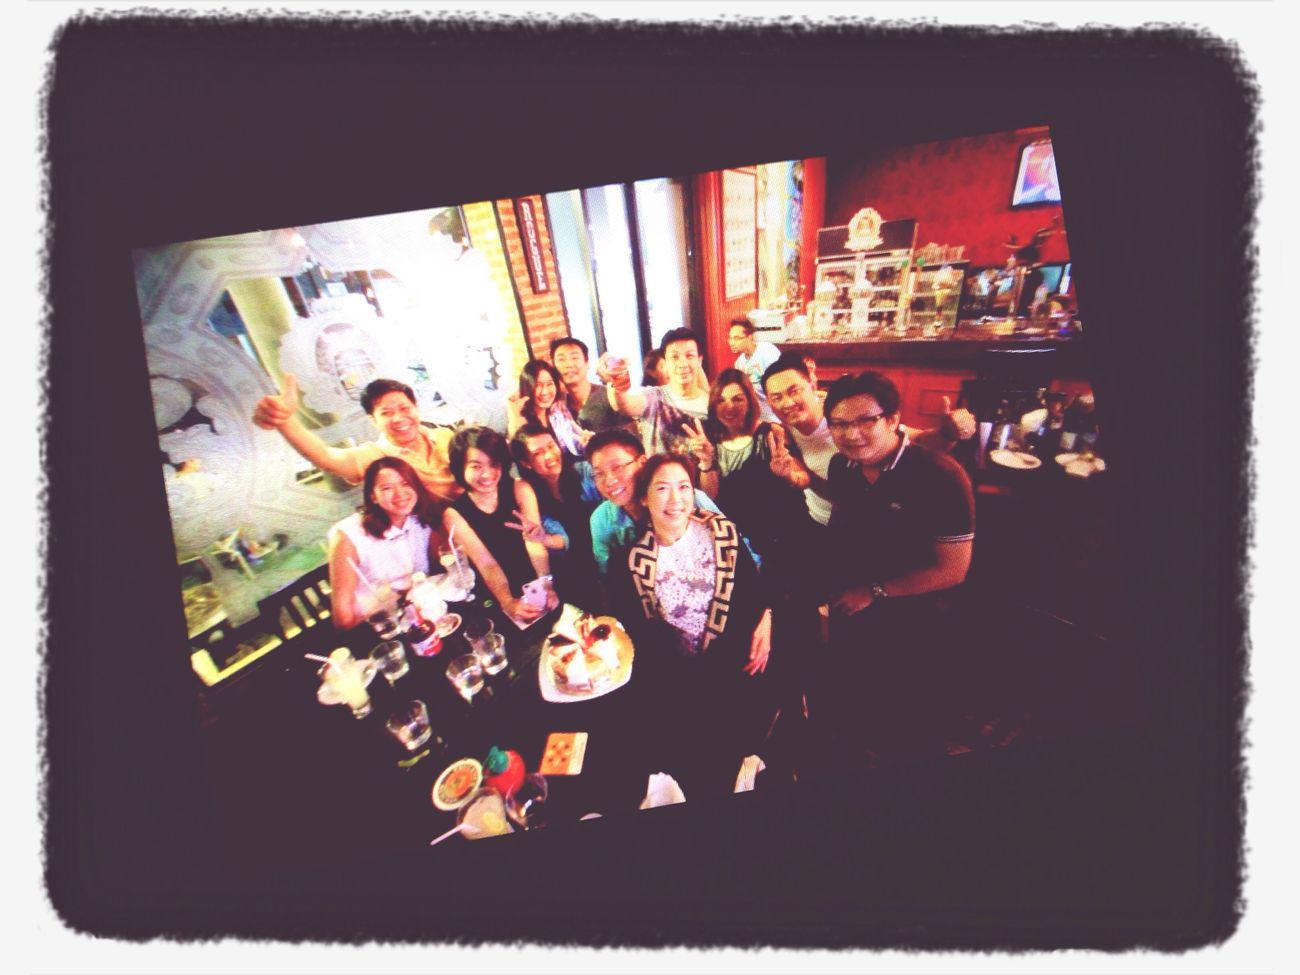 My Birthdaye] My Birthday with good Friends Cheers !